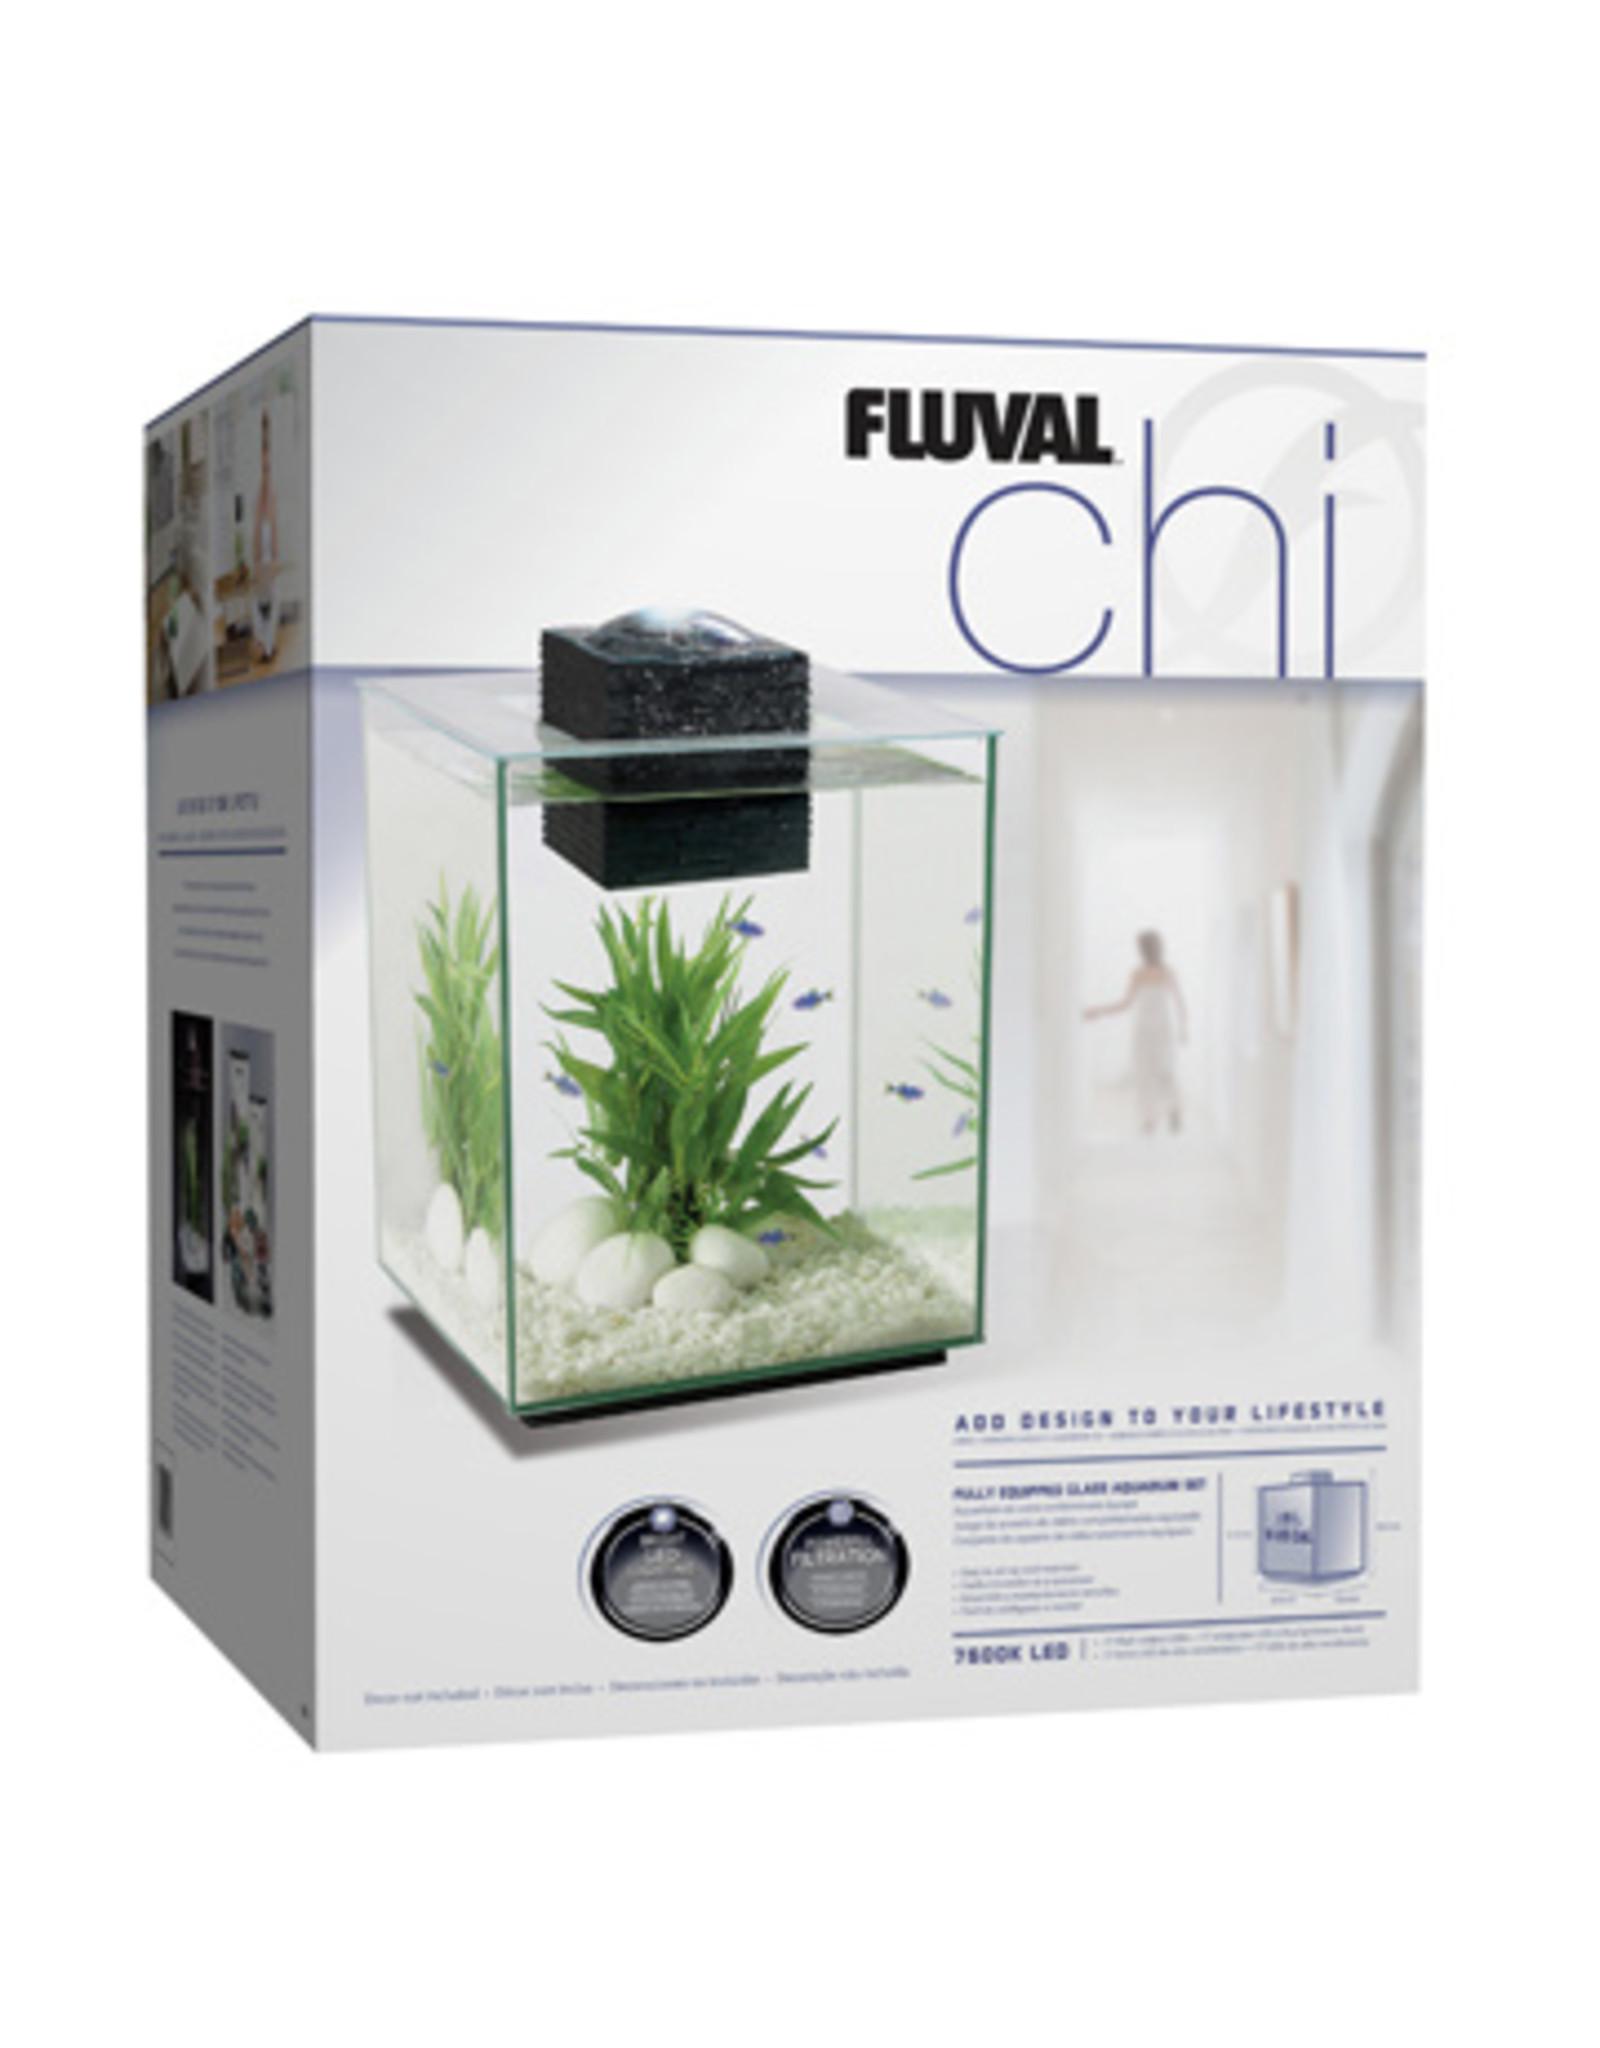 Fluval FLUVAL Chi II Aquarium Kit 5Gal (19L)